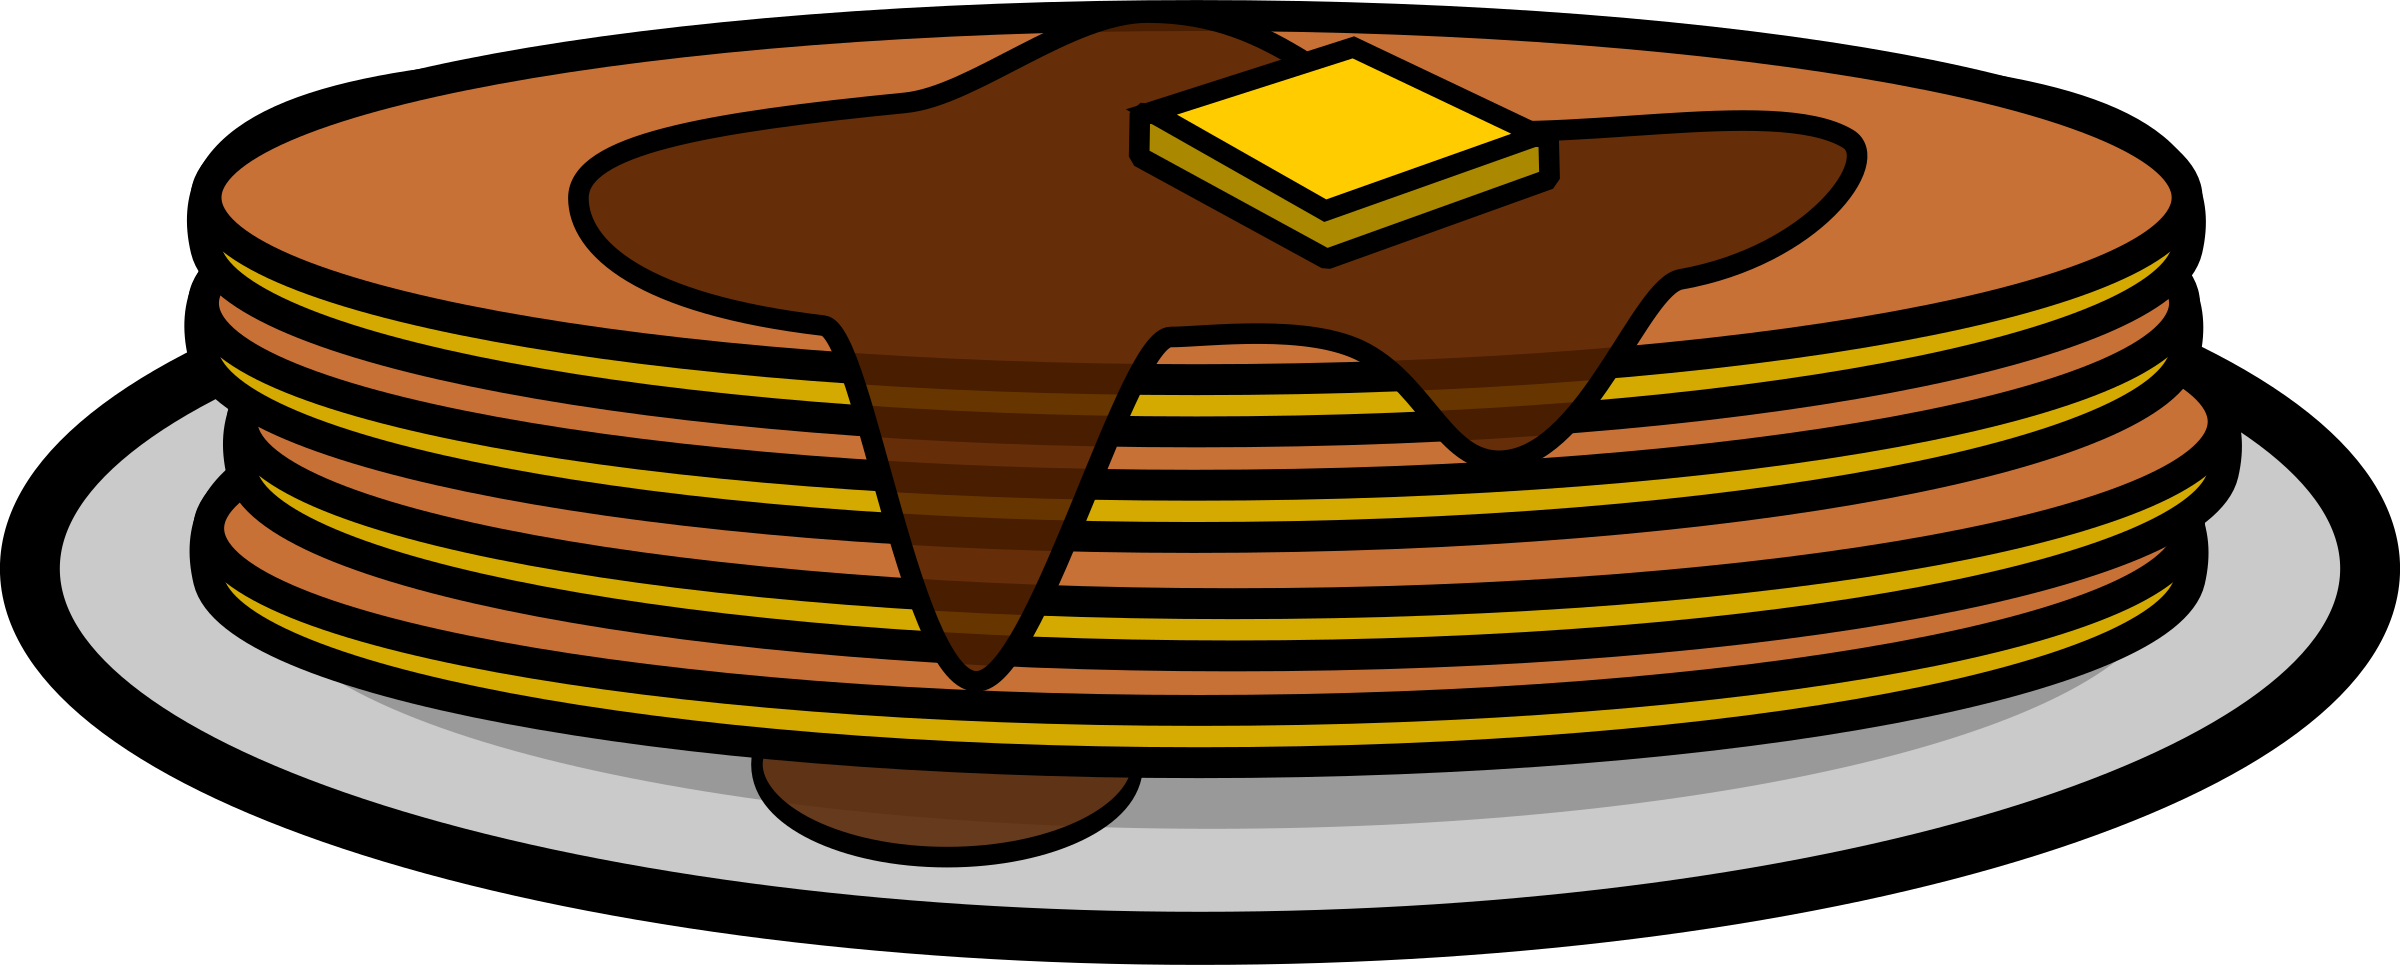 Clipart pancakes